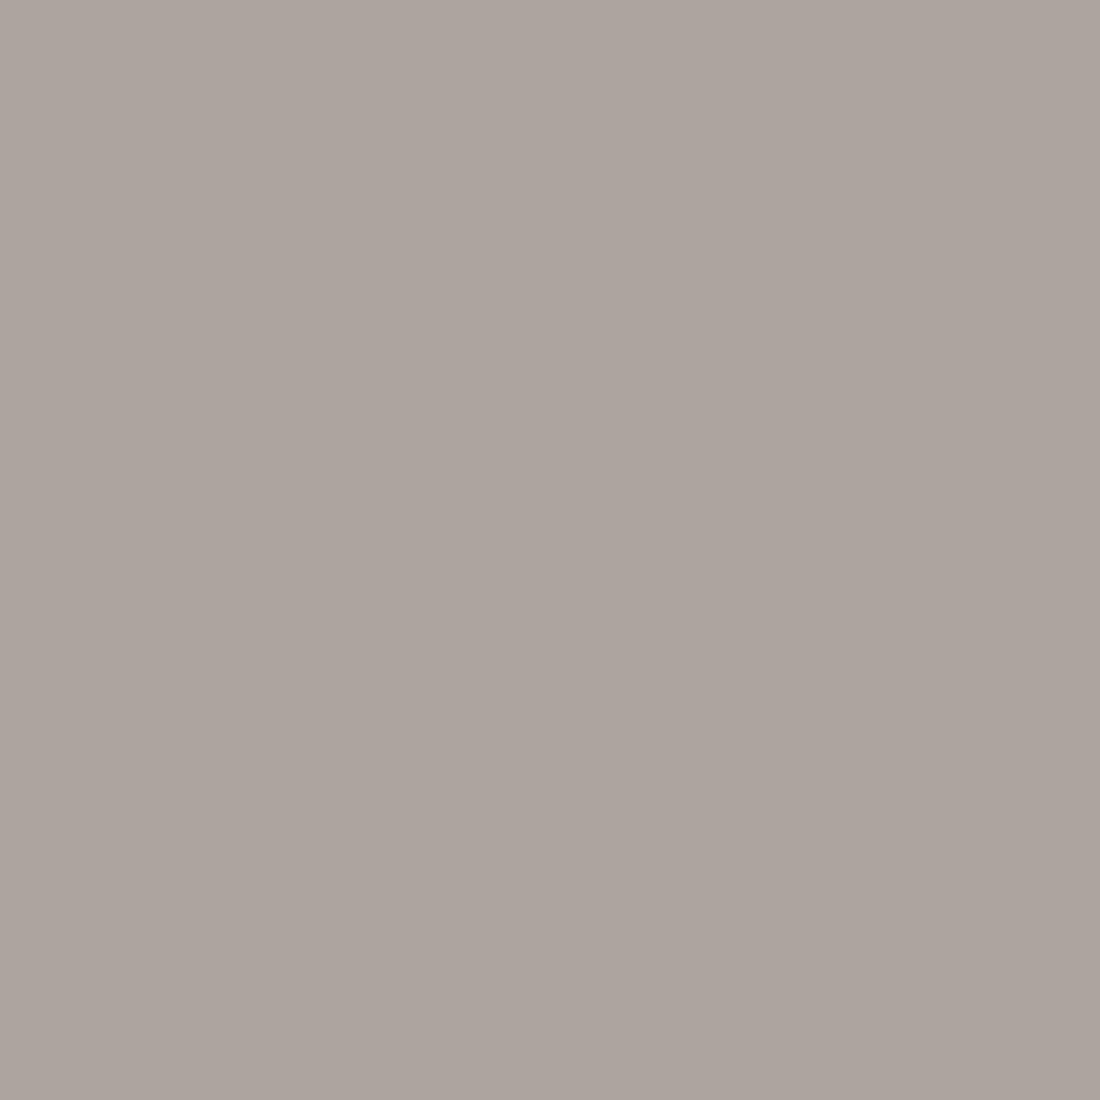 Kristal 61x61 Grey Gloss 1